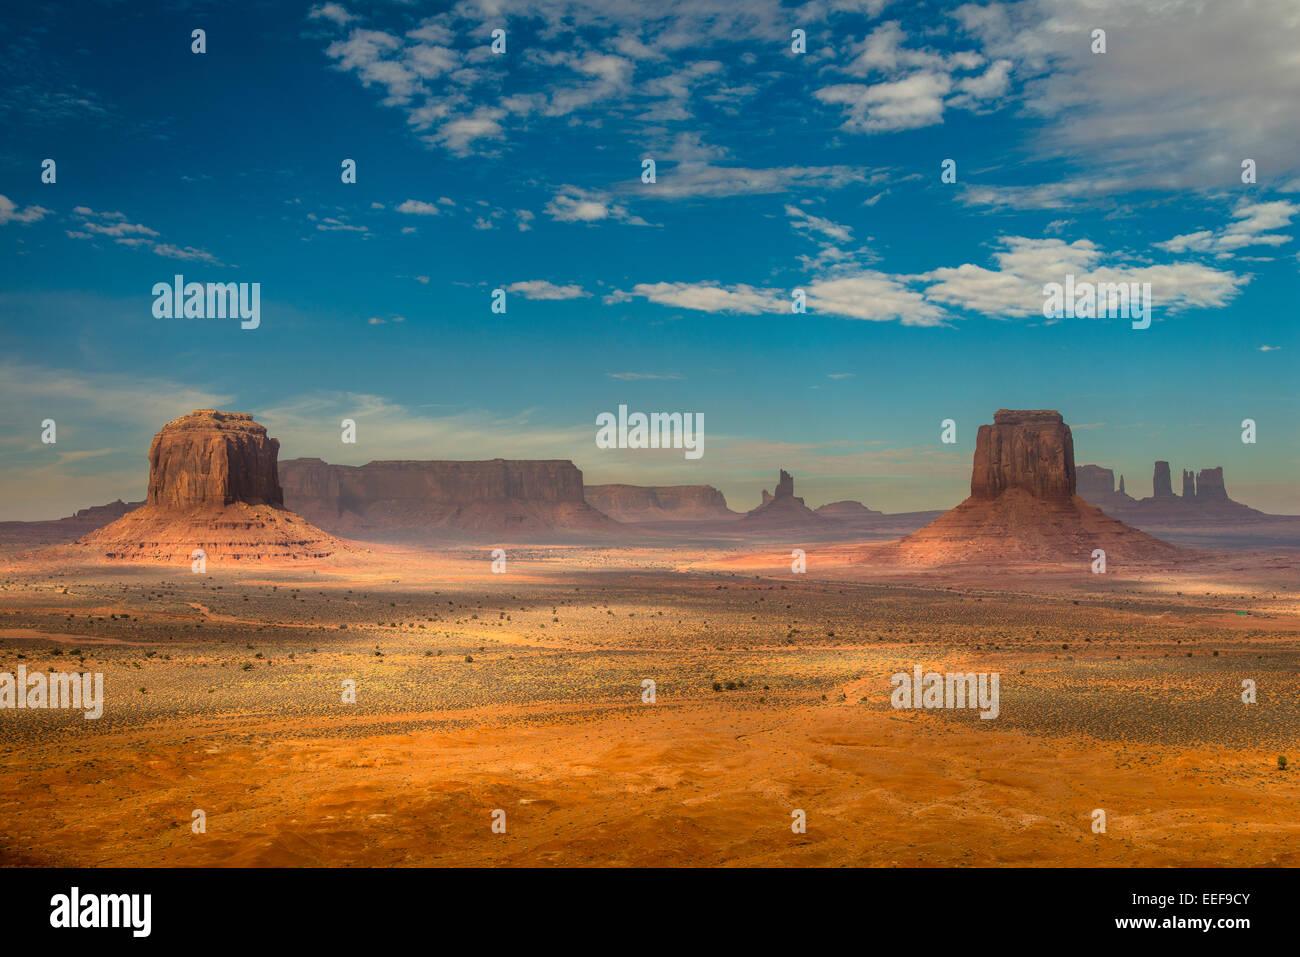 Panoramablick vom Punkt des Künstlers, Monument Valley Navajo Tribal Park, Arizona, USA Stockbild